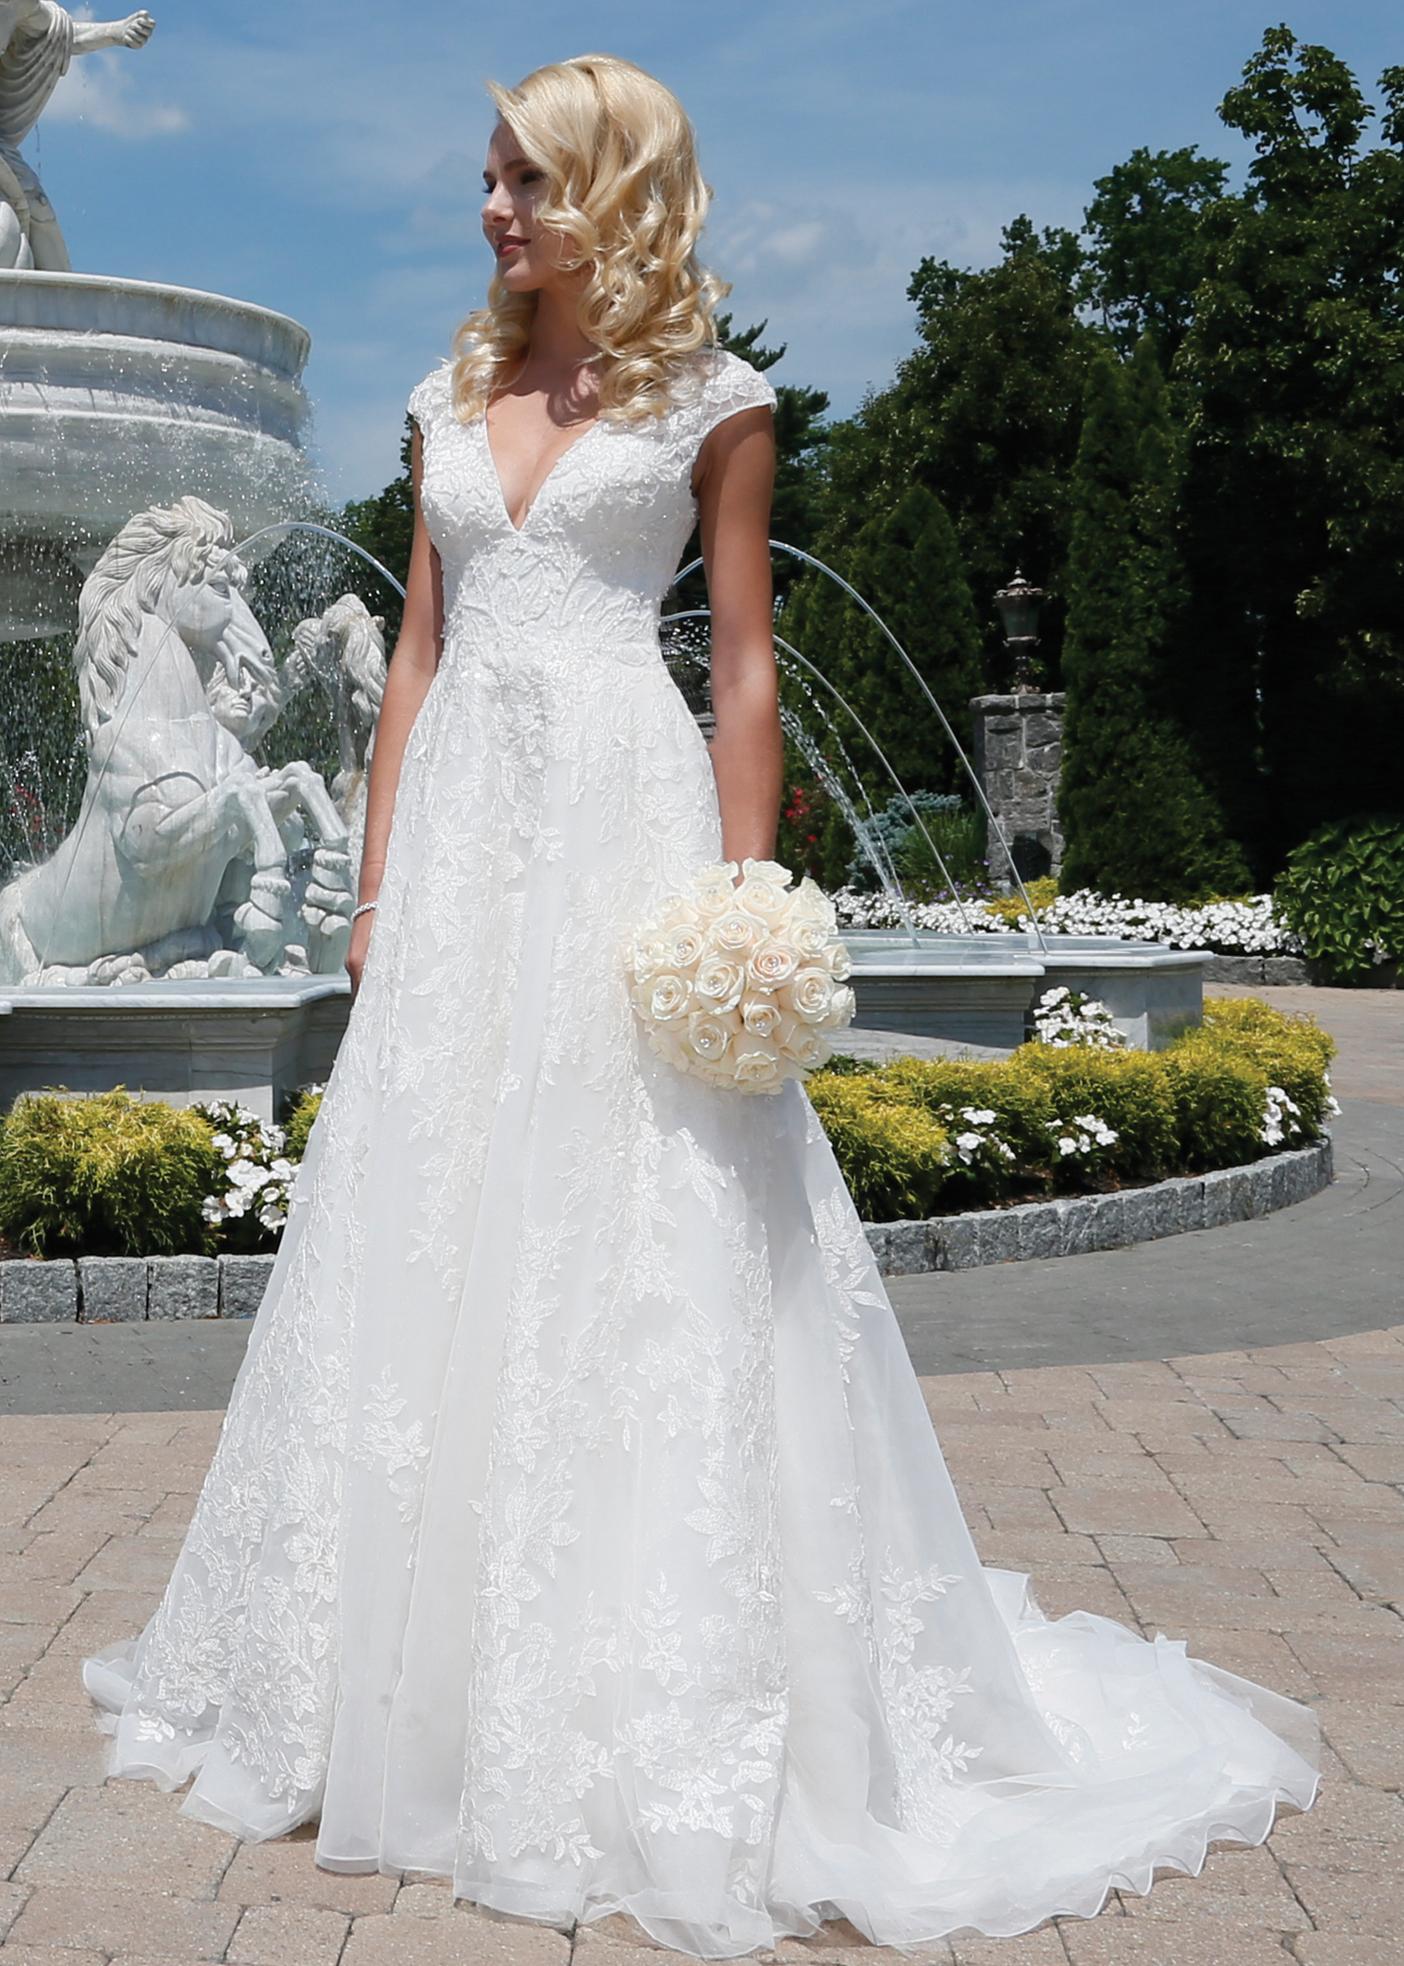 A-Line Ballgown Bridal Wedding Dress by Oleg Cassini - NY, NJ